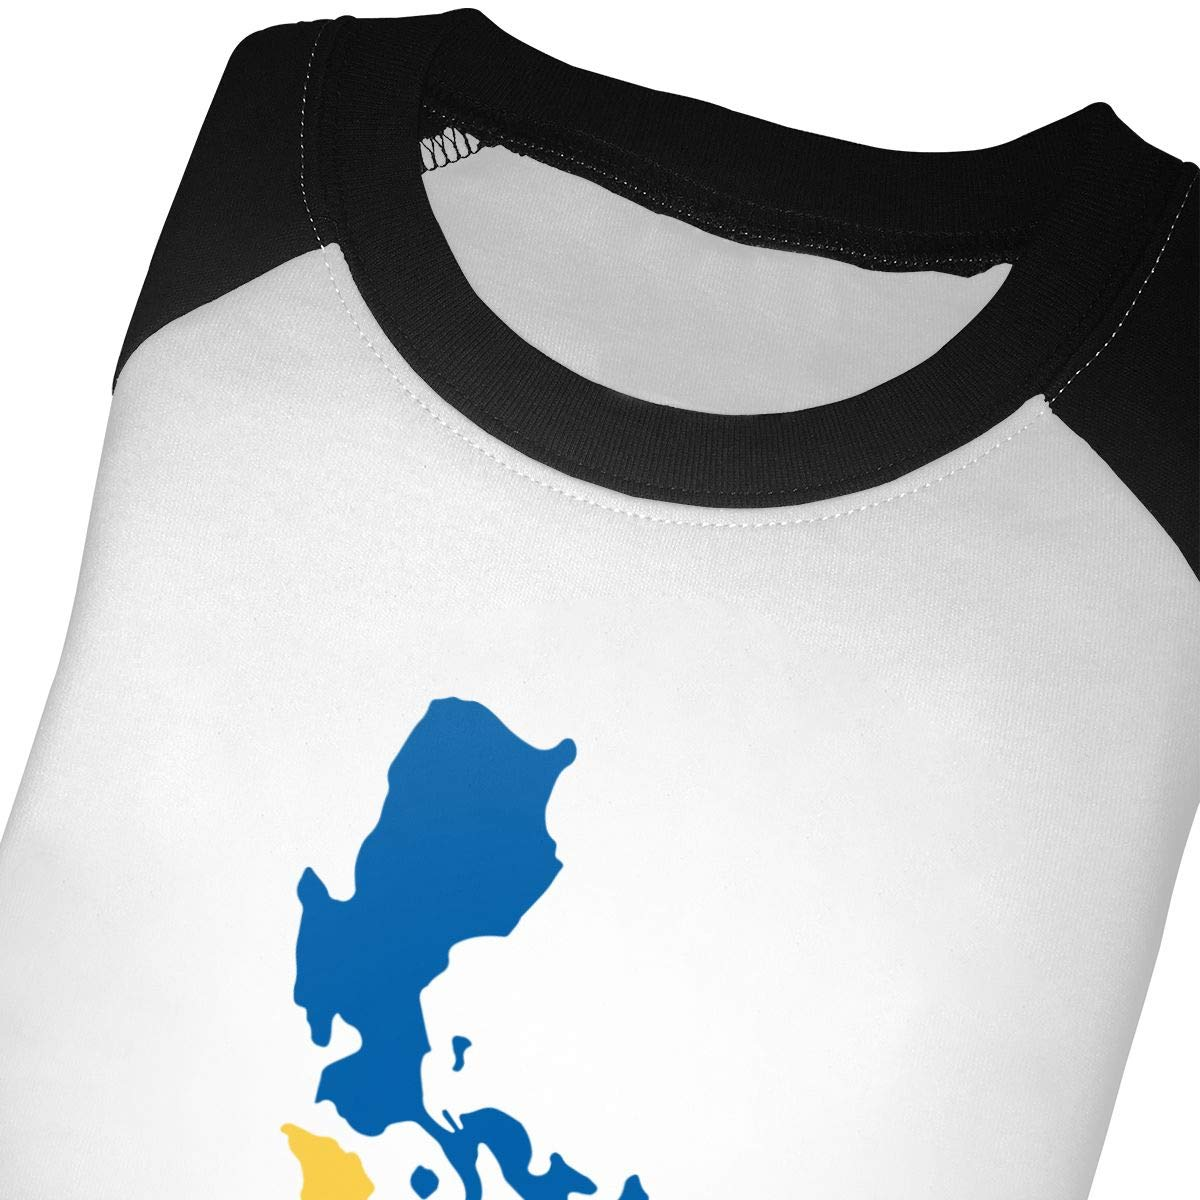 QPKMRTZTX0 Boys Girls Kids /& Toddler Filipino Map Philippines Flag2 Long Sleeve Tees 100/% Cotton